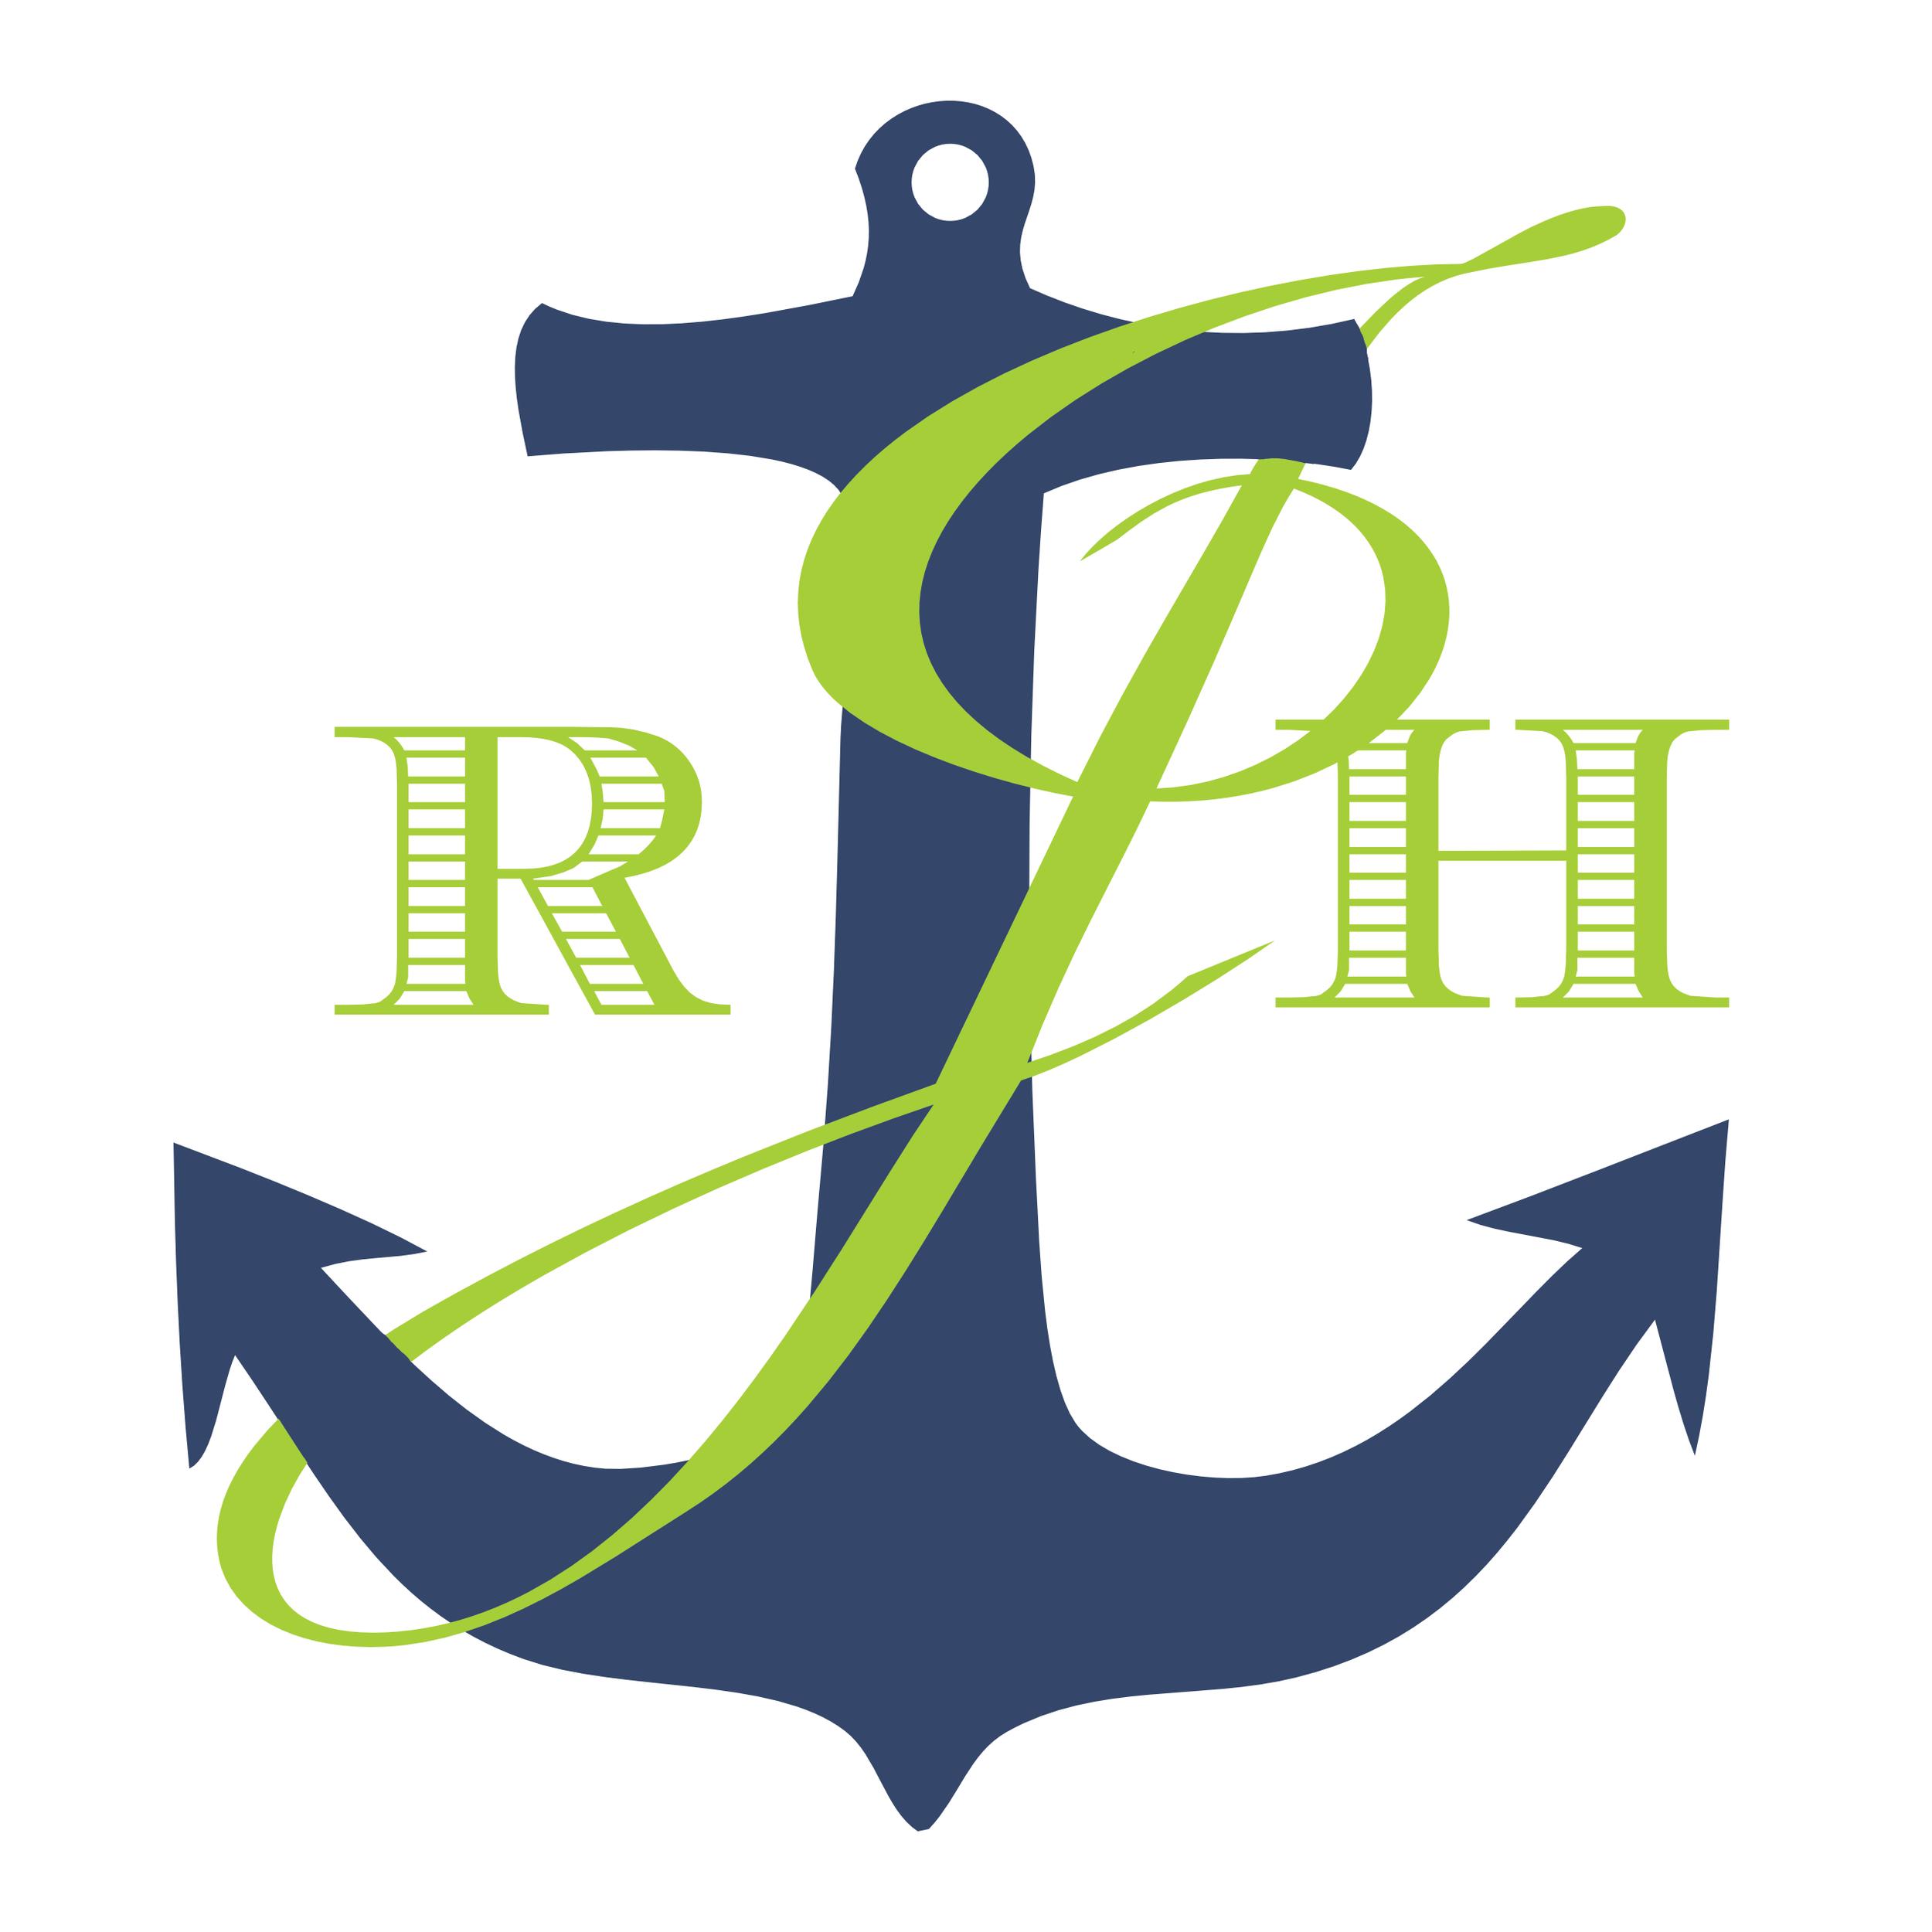 HRJ anchor logo 2.png